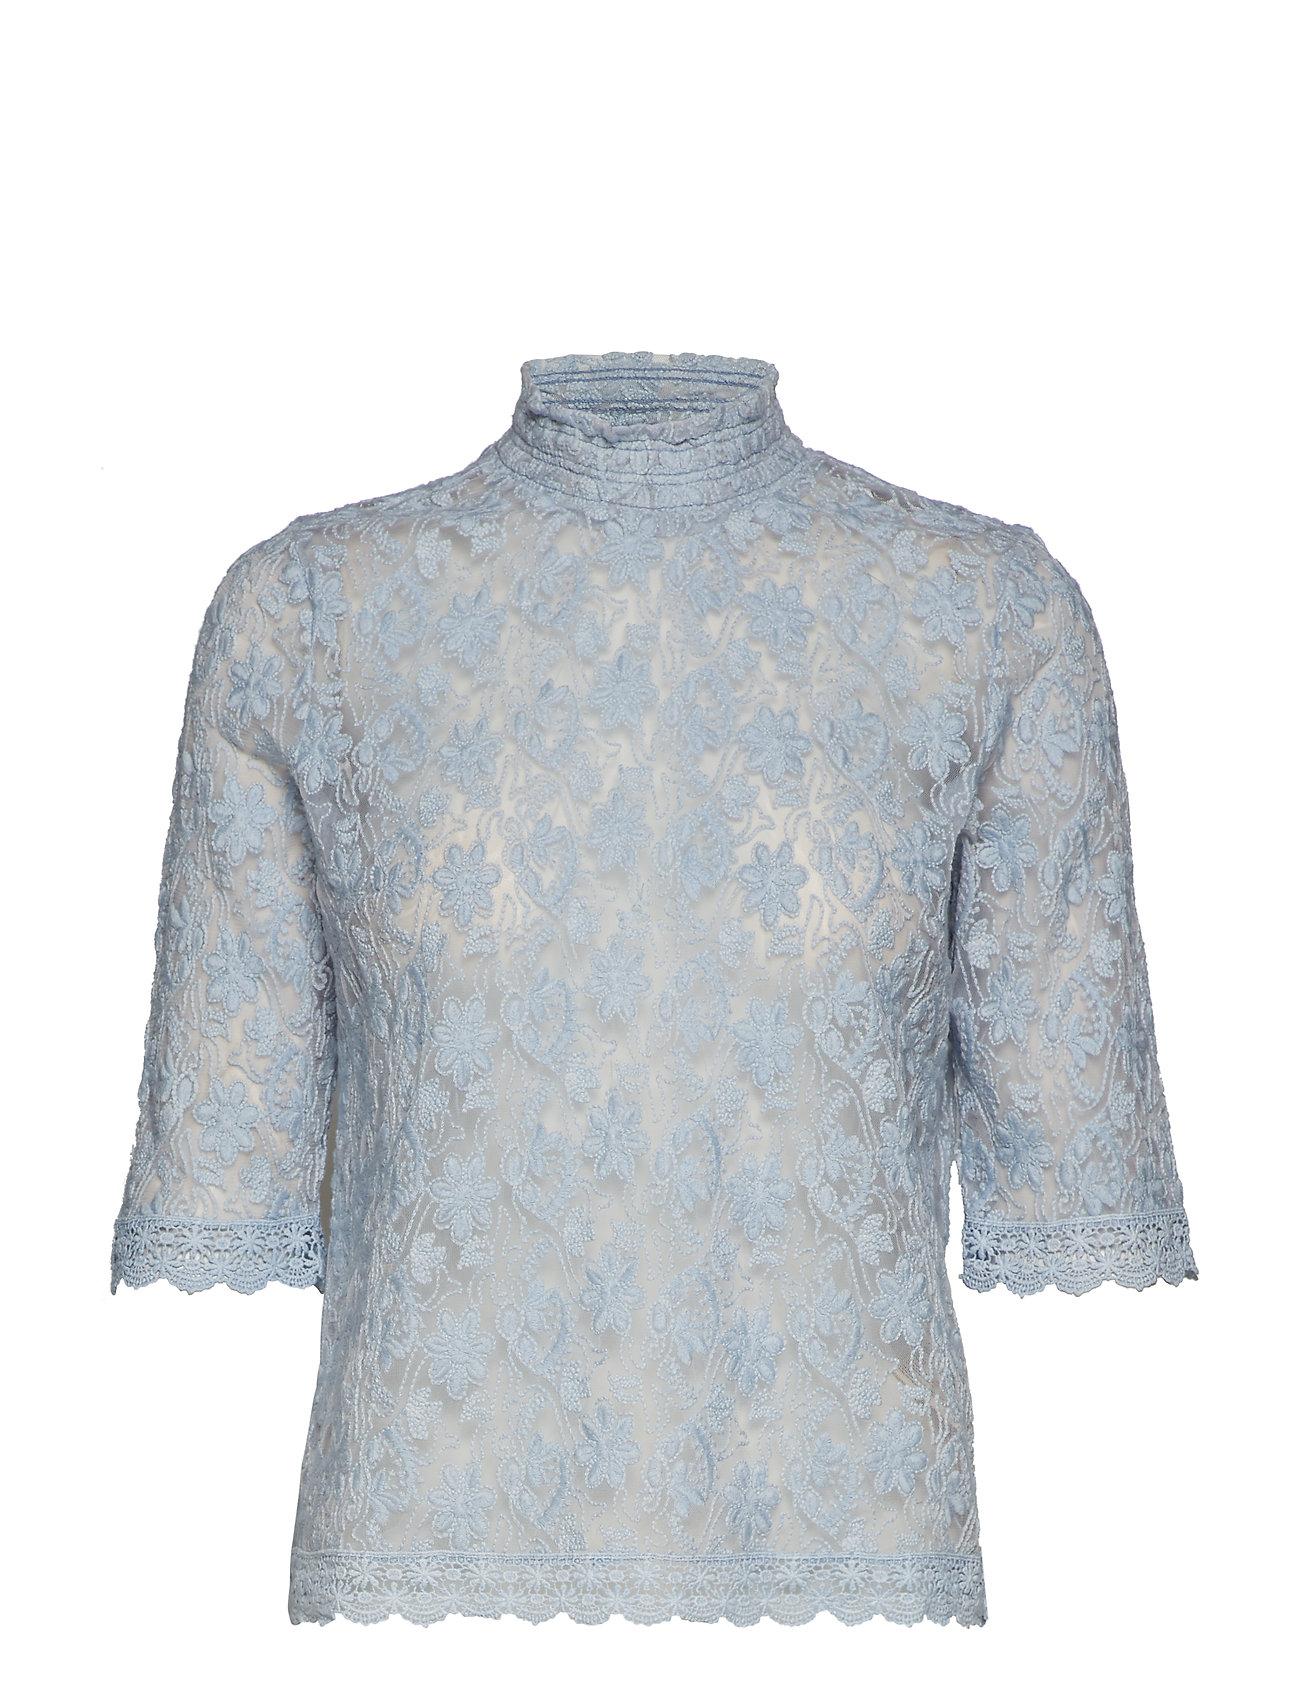 ODD MOLLY sway high blouse